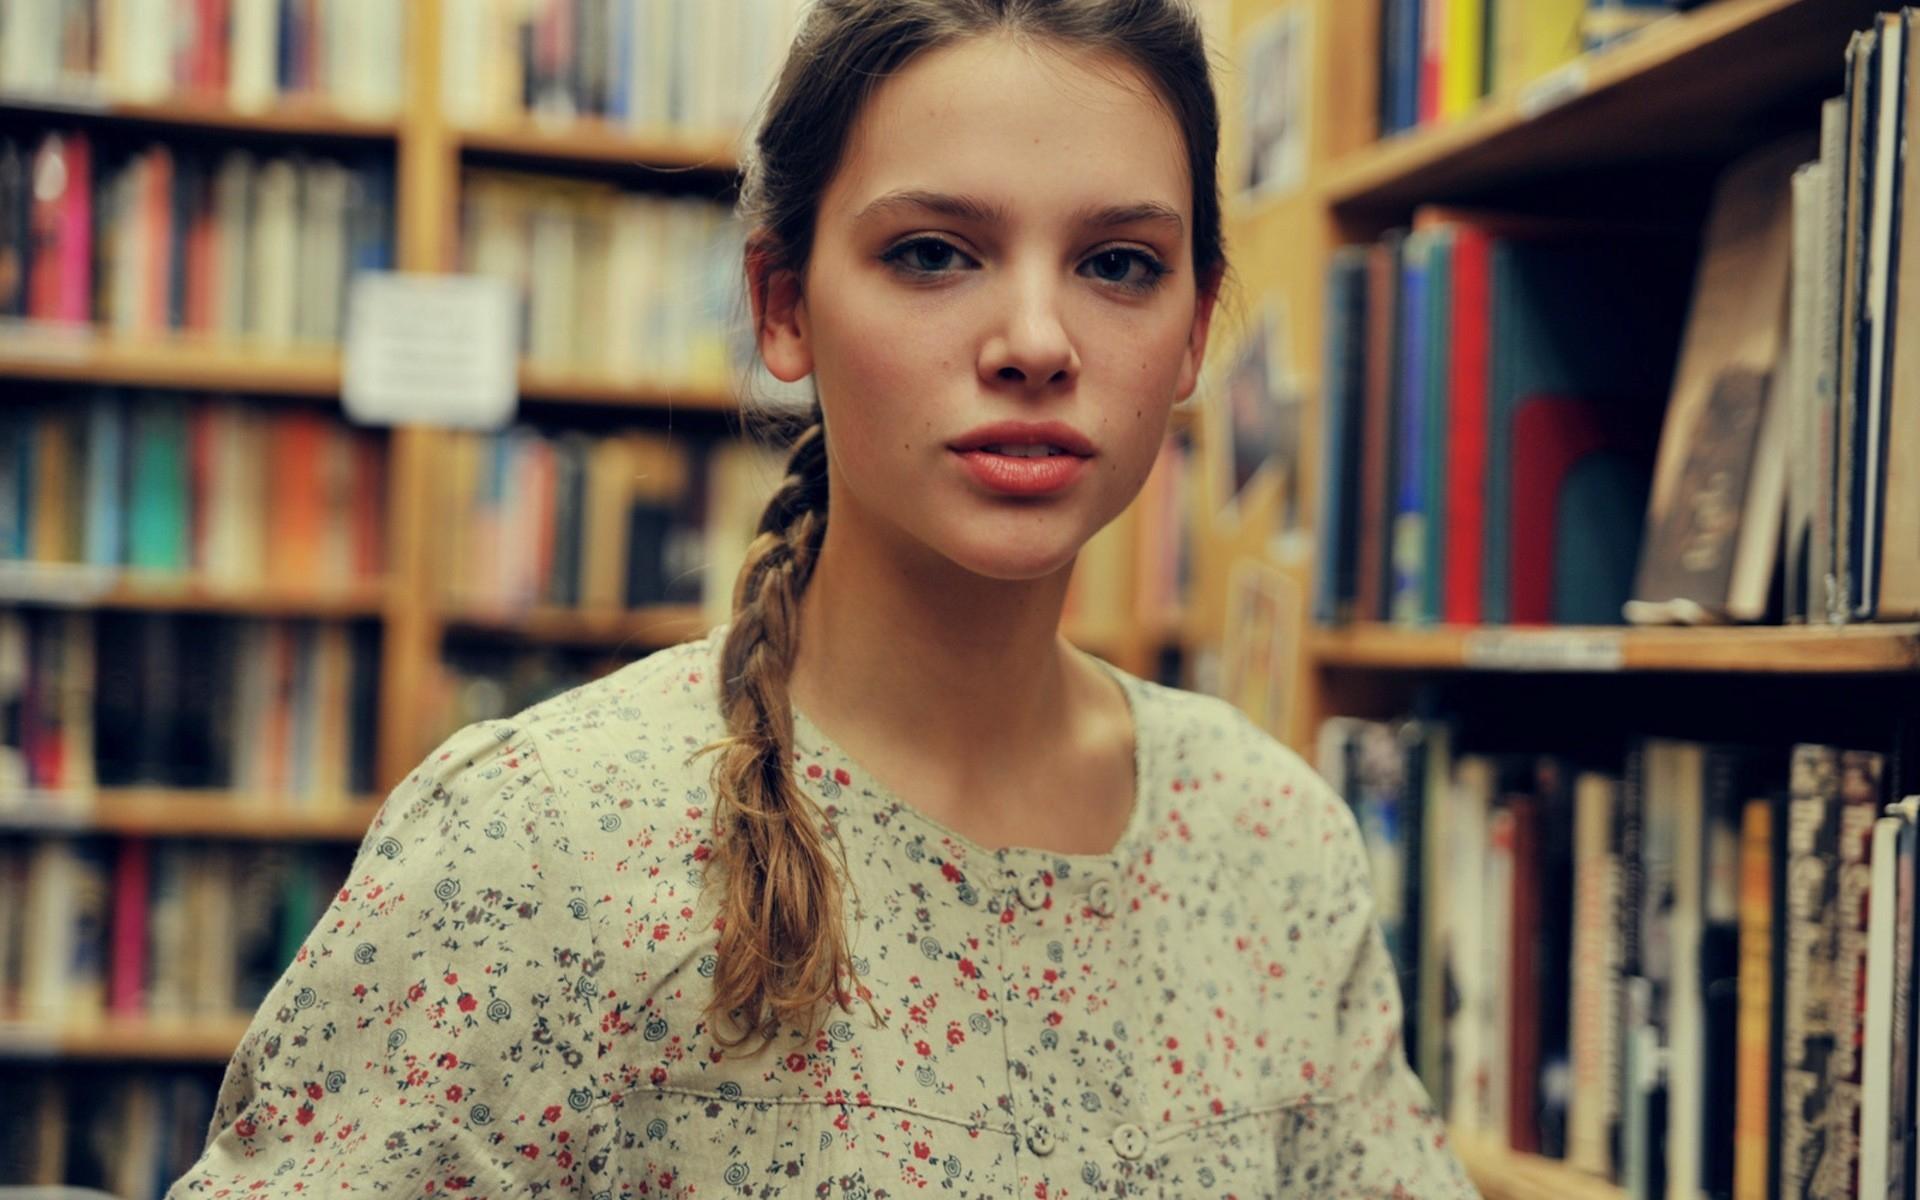 Картинки девушка, платье, книги, полки фото и обои на рабочий стол